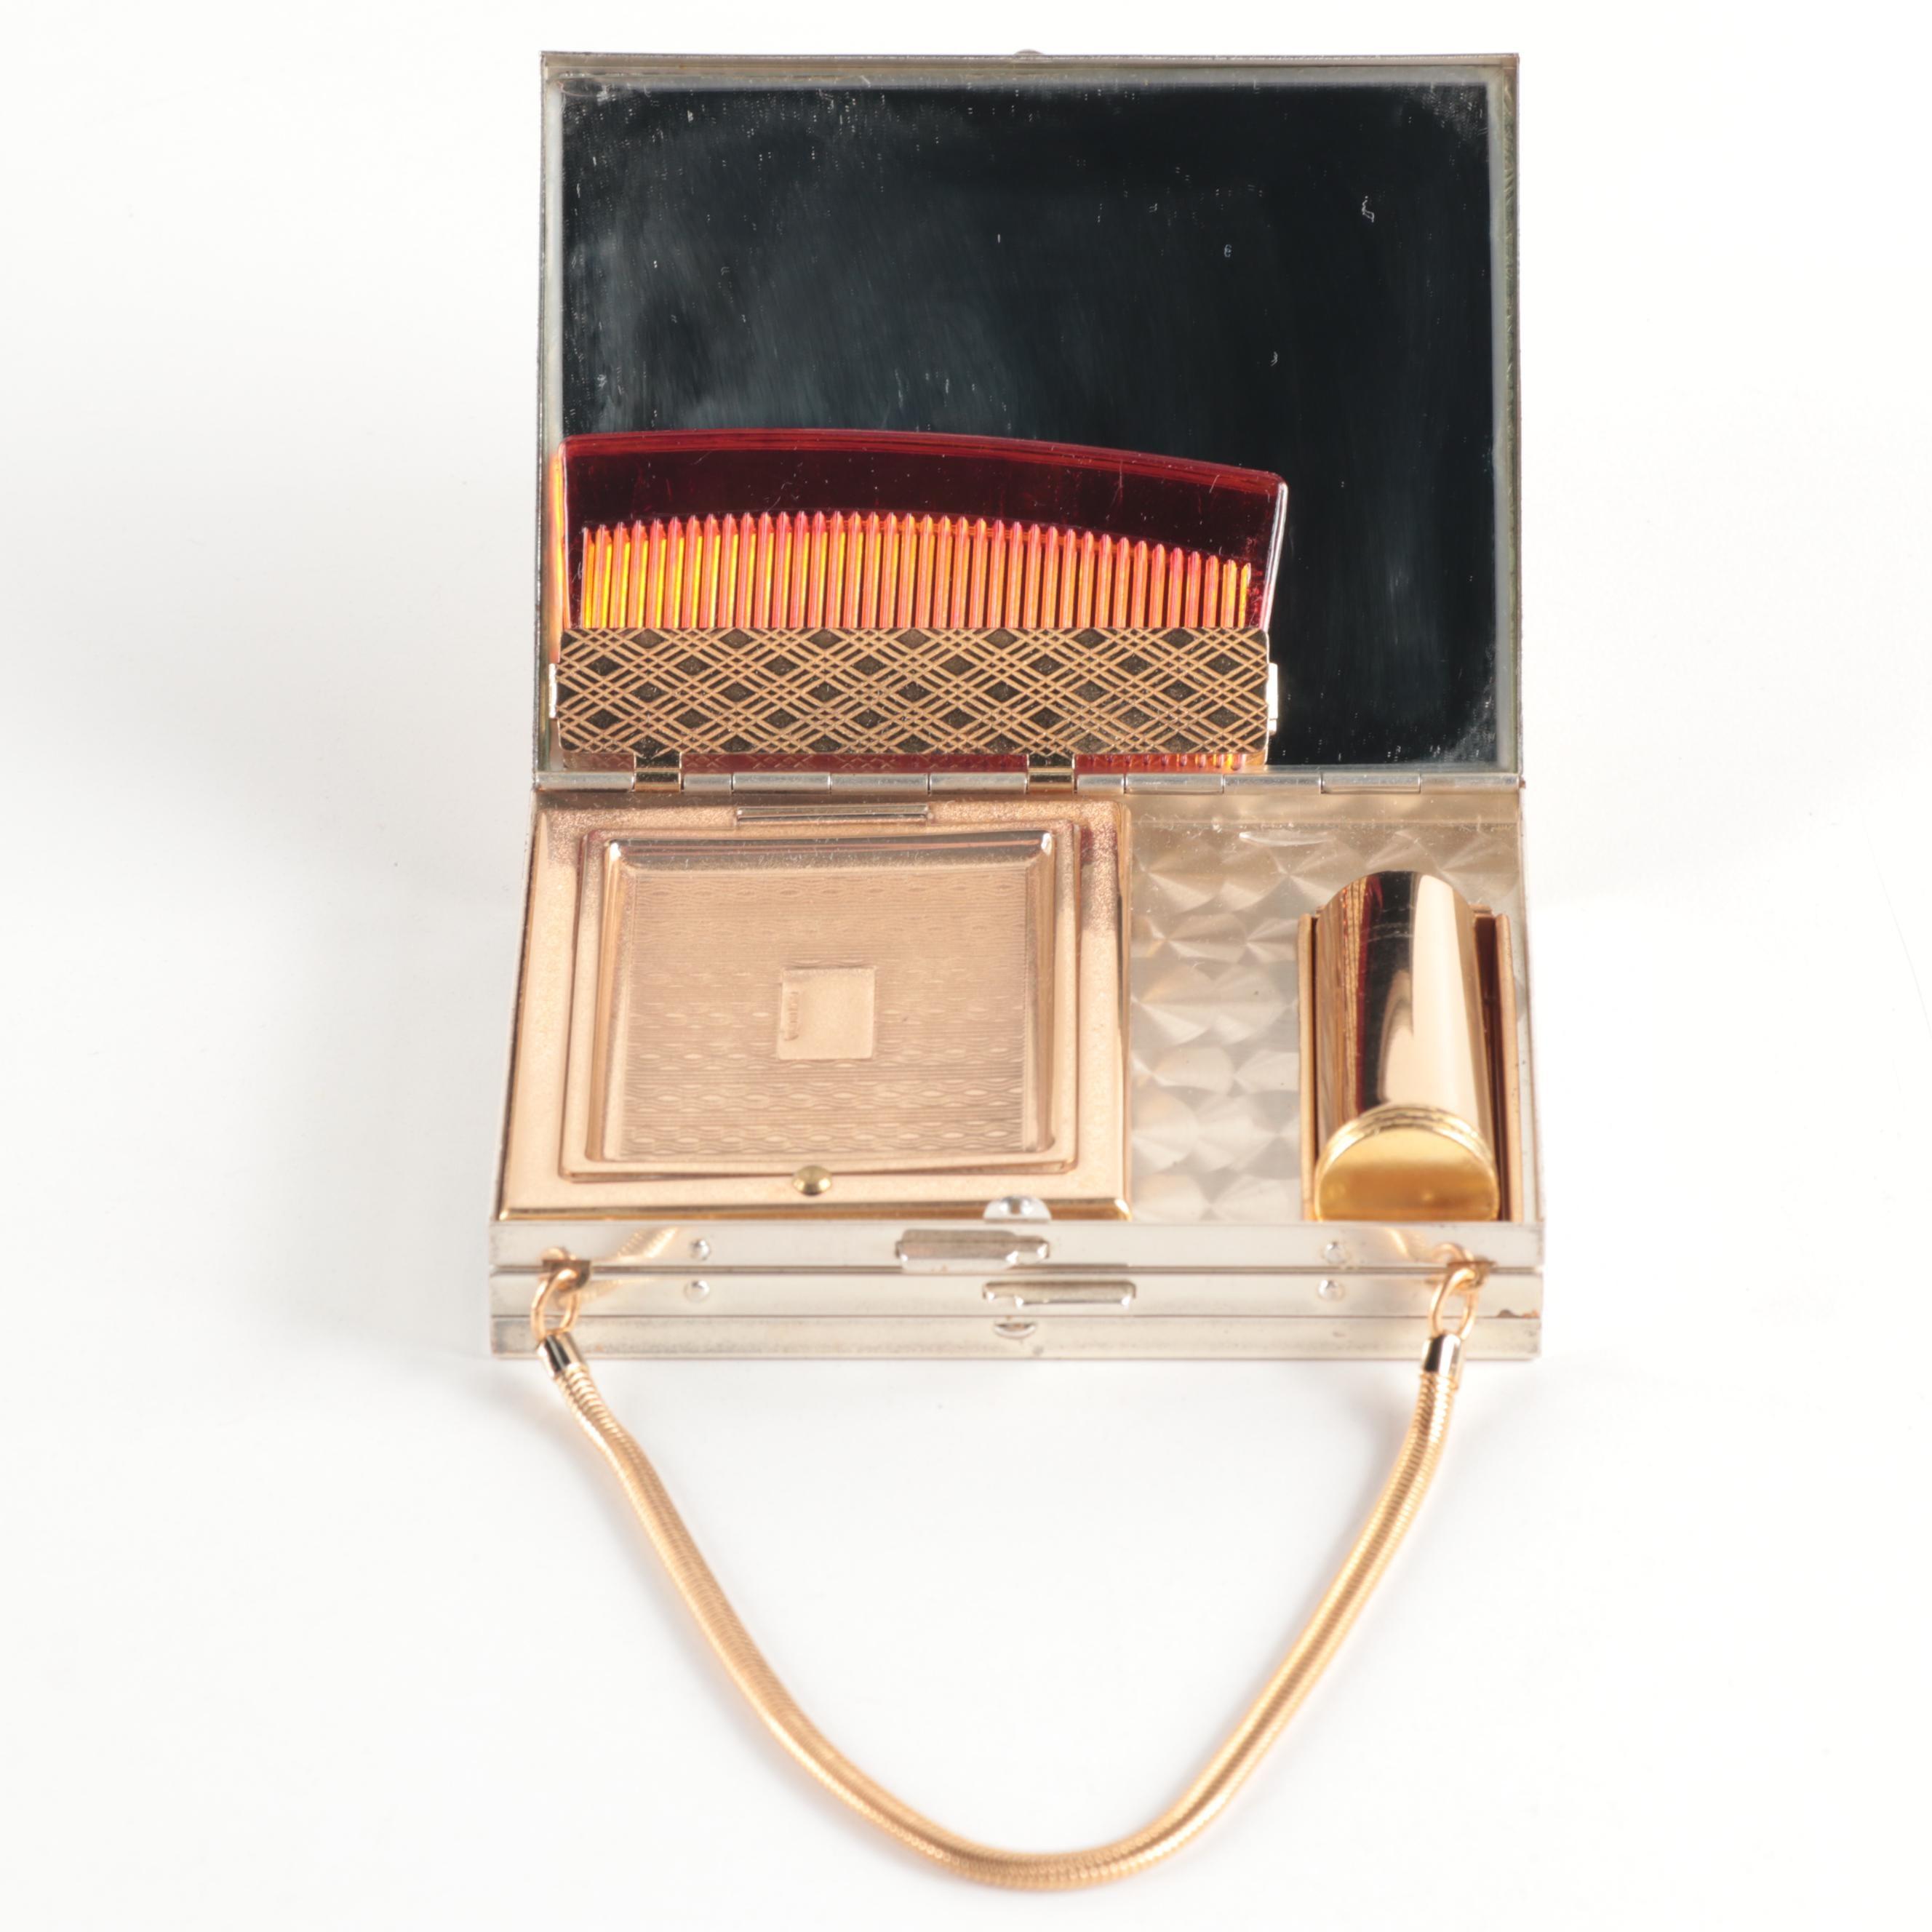 Vintage Gold and Silver Tone Floral Motif Compact Handbag